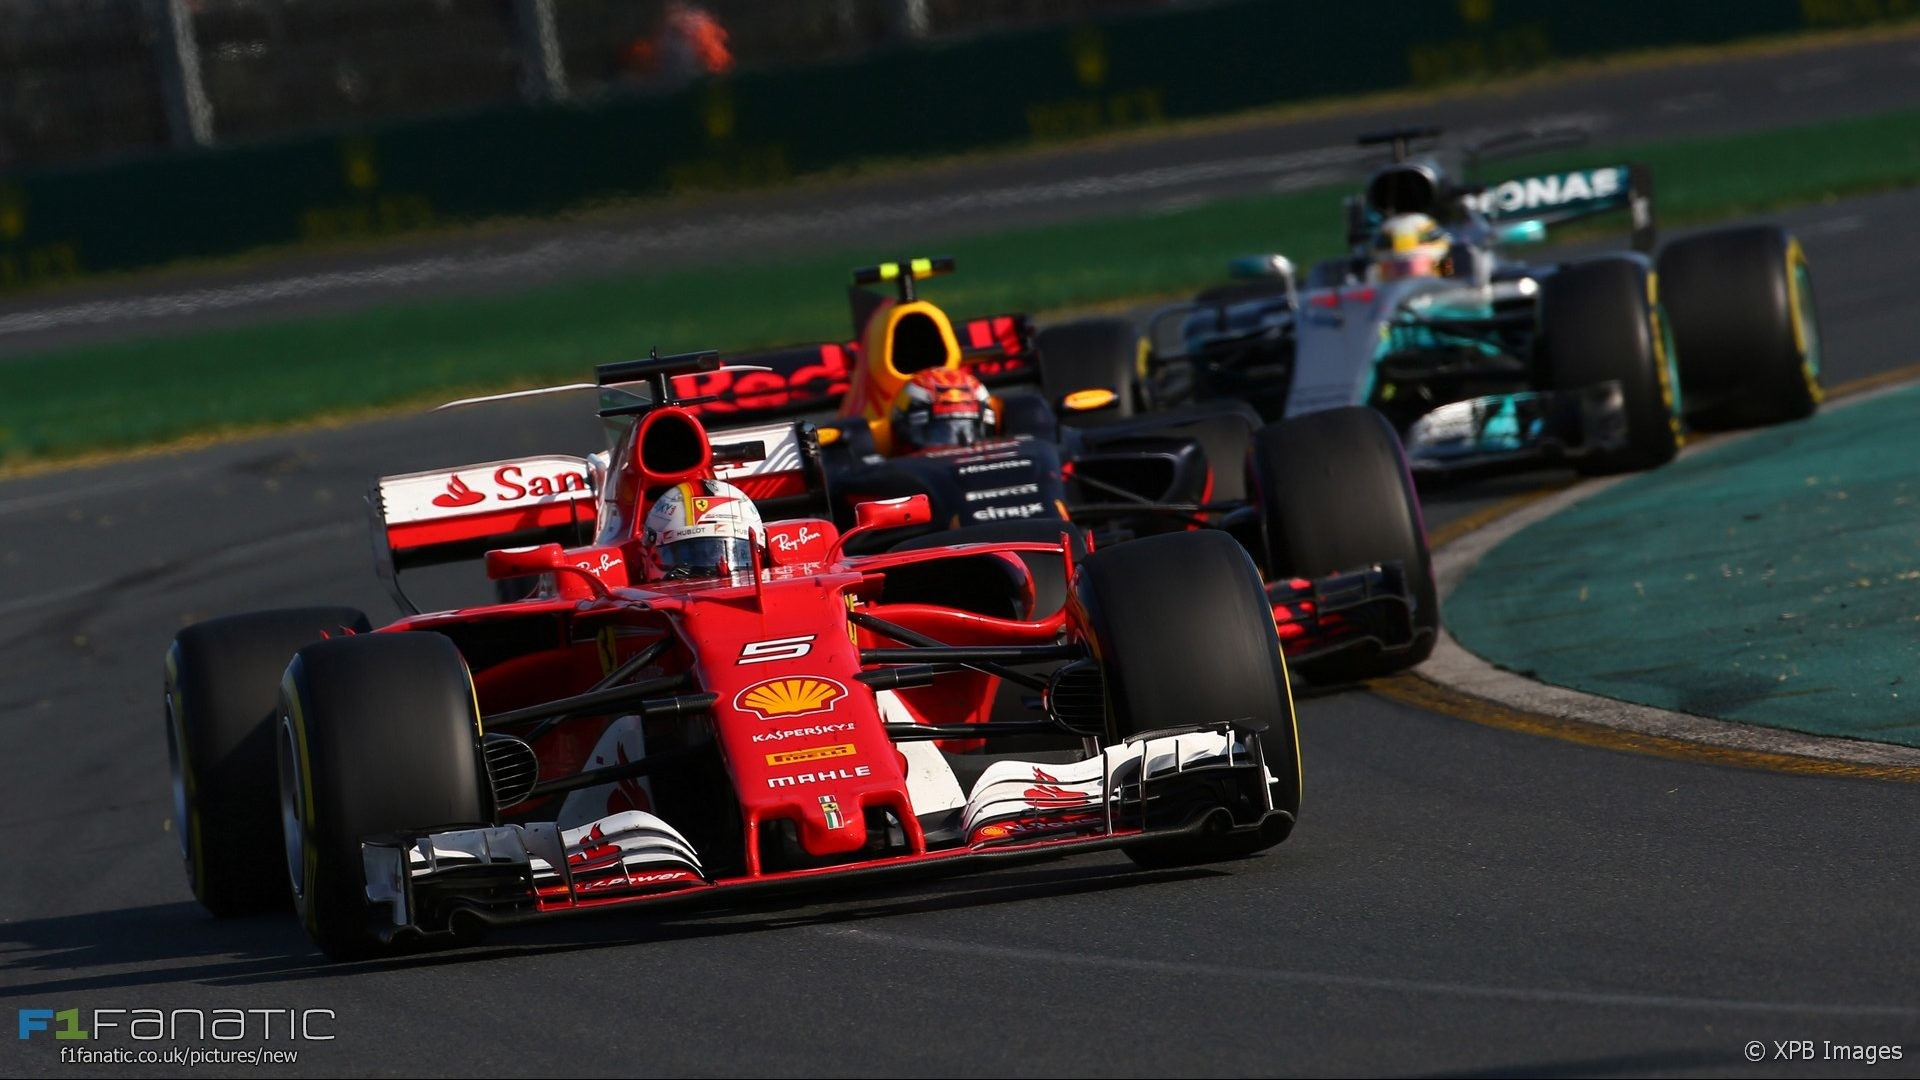 Sebastian Vettel Ferrari Albert Park 2017 Data Formula 1 2017 1920x1080 Download Hd Wallpaper Wallpapertip